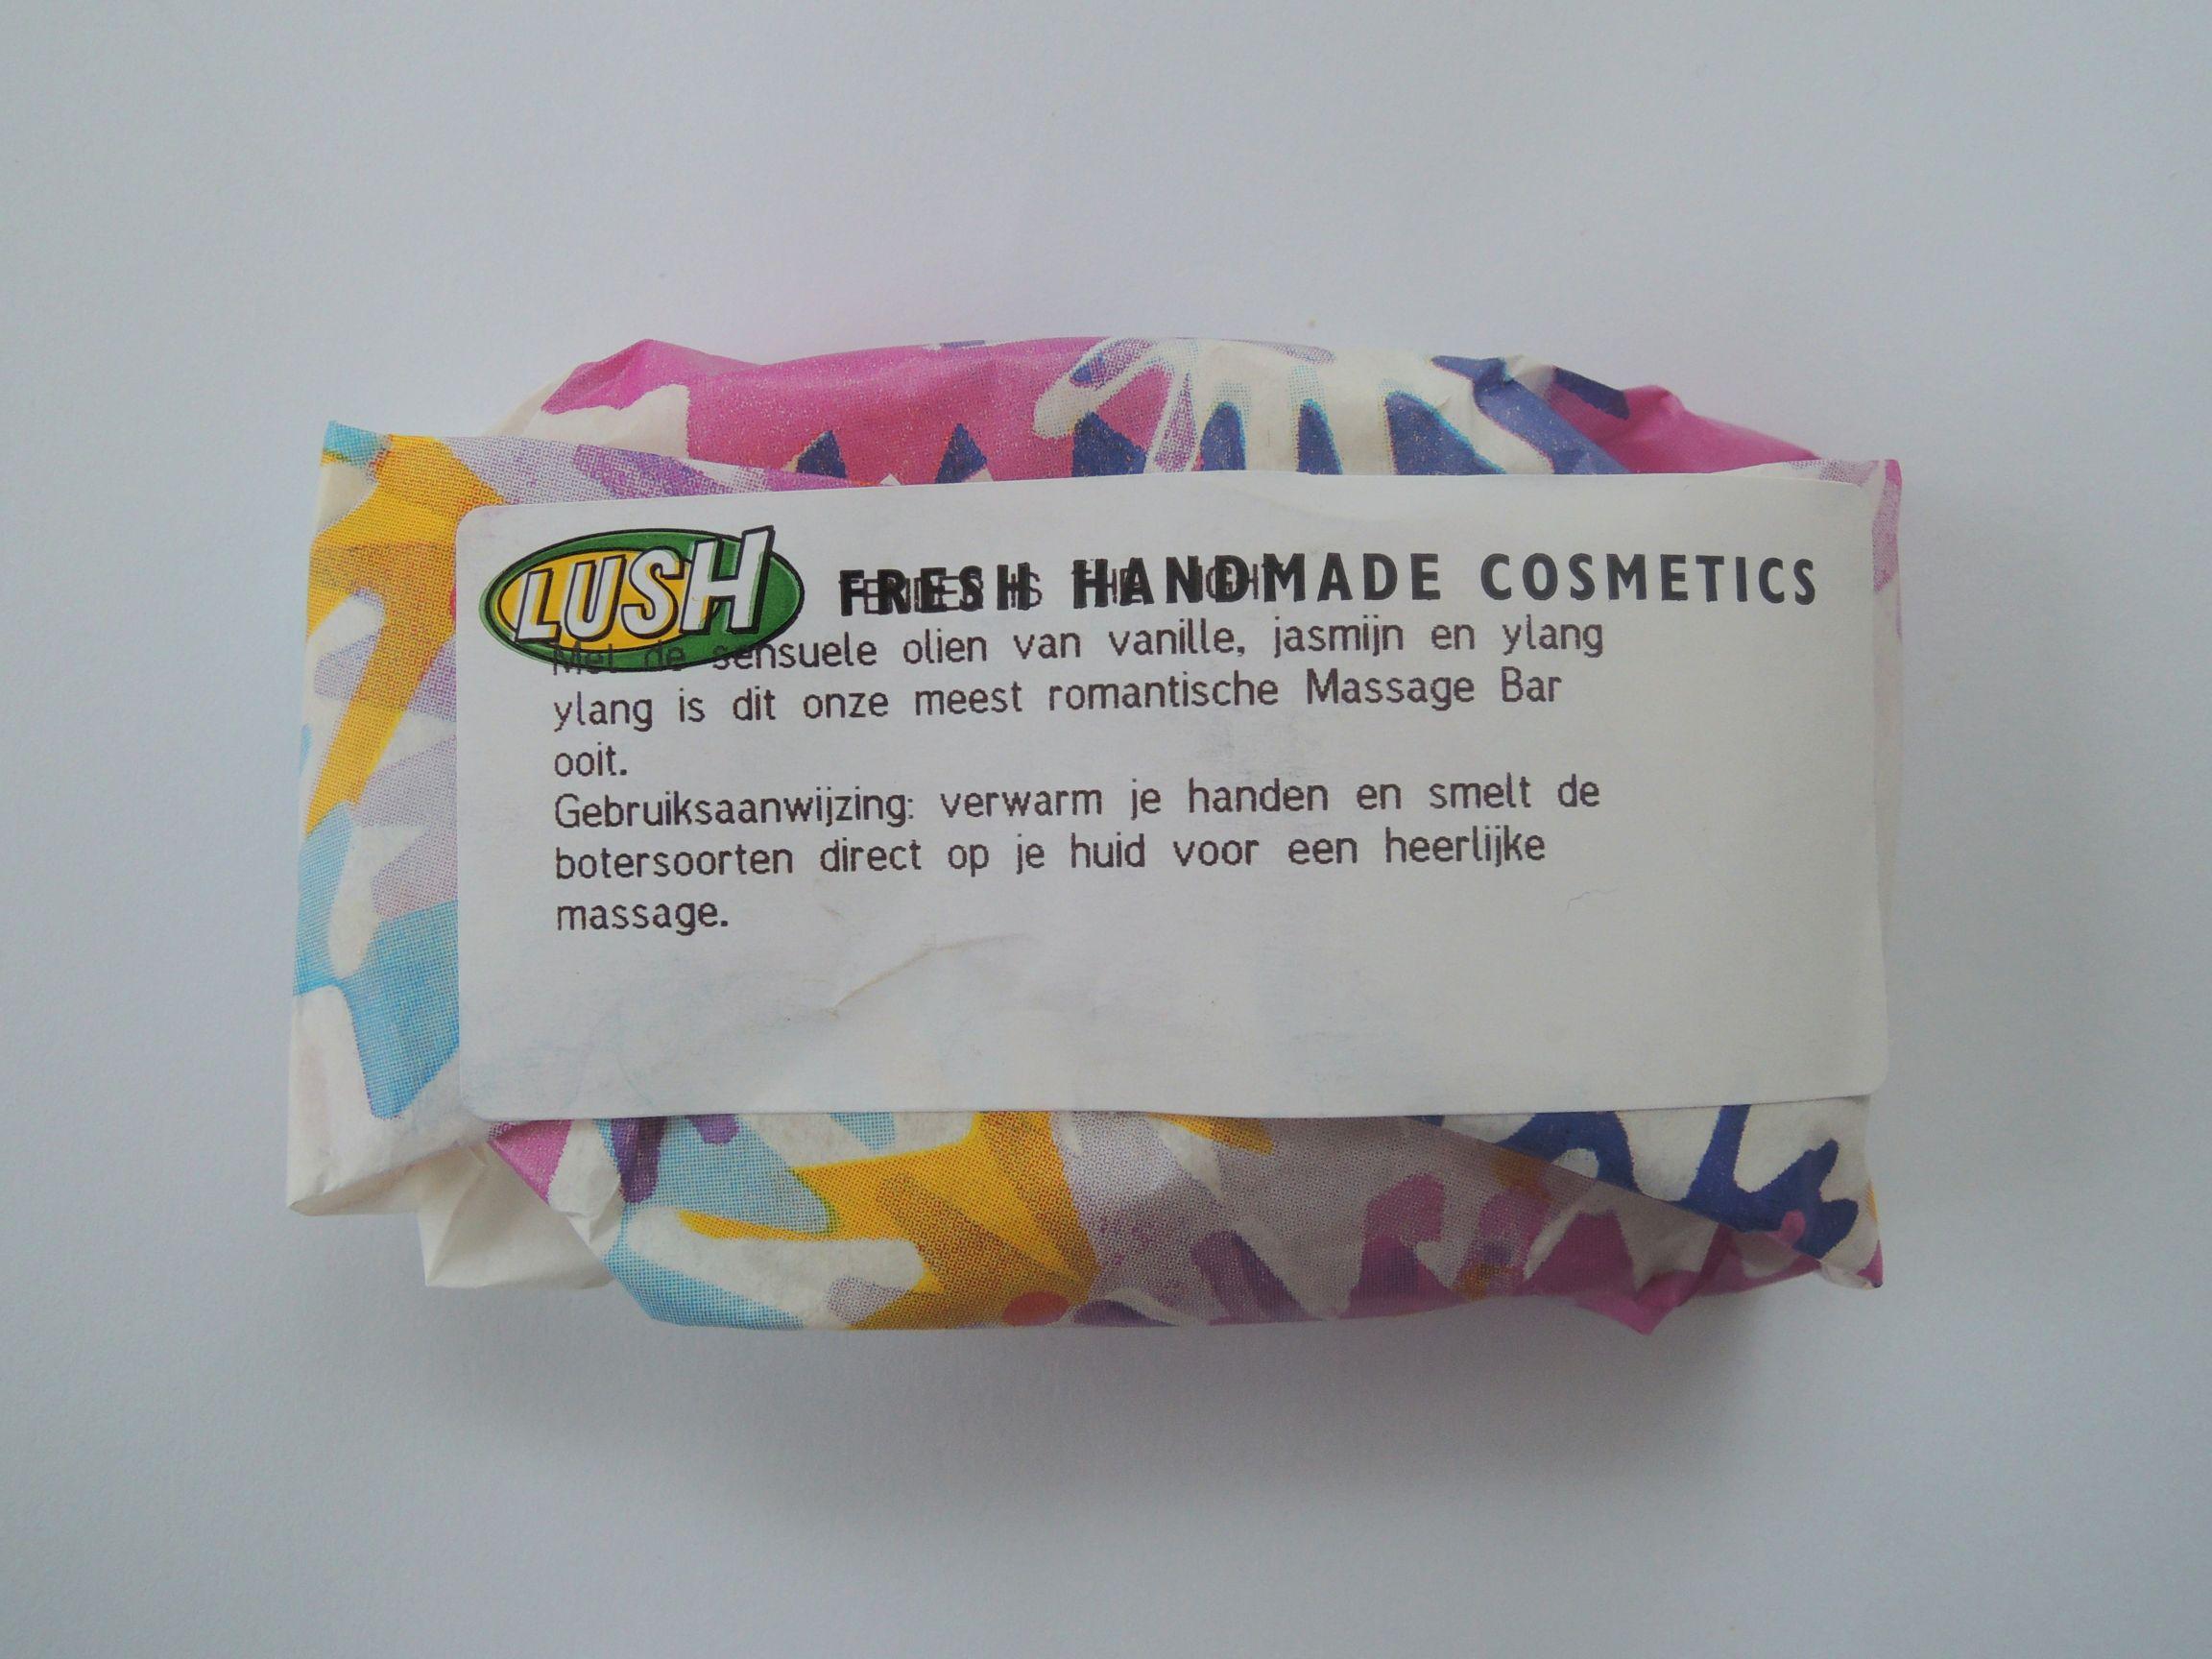 Lush (11)